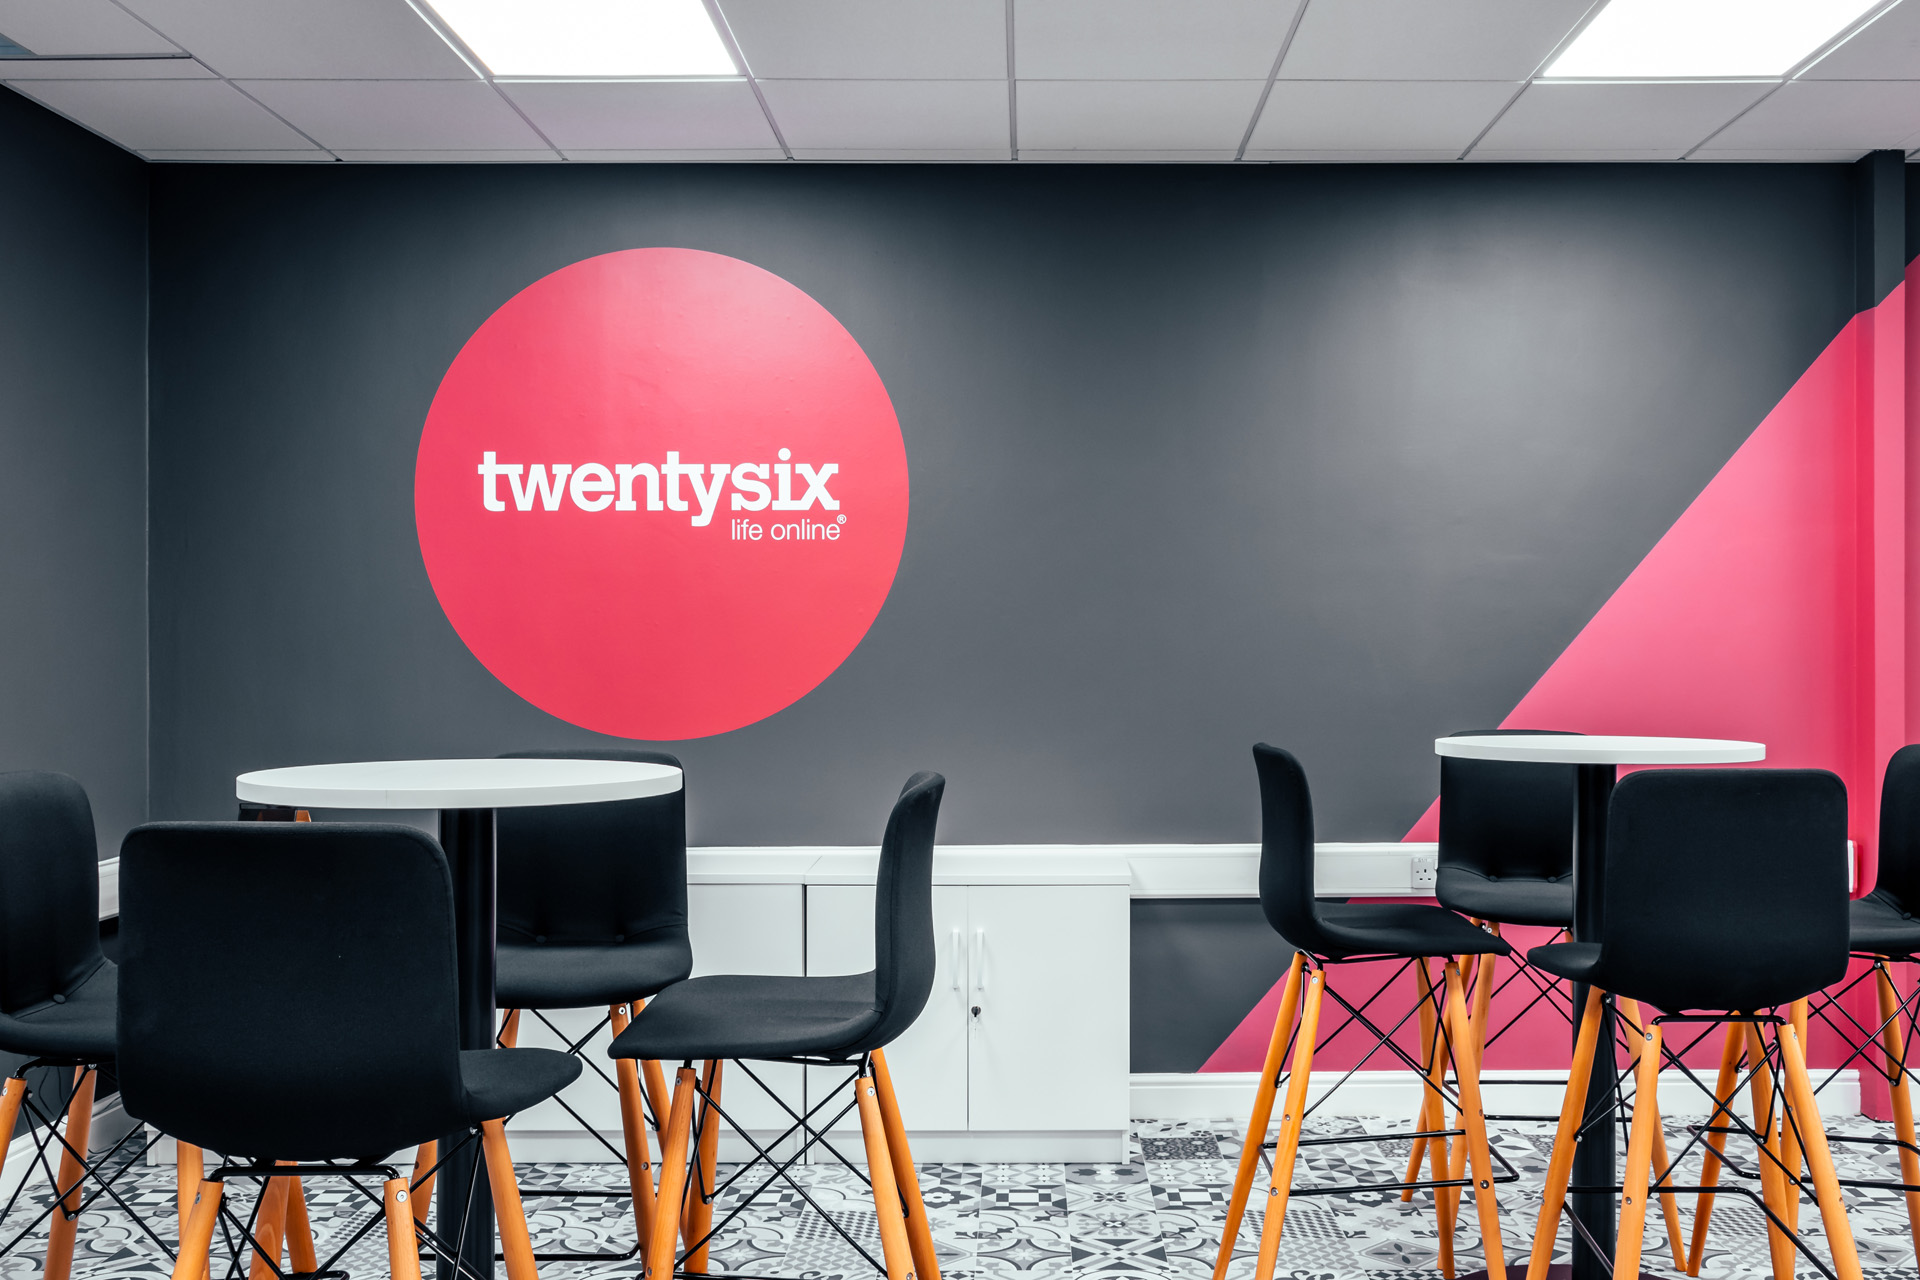 TwentySix Digital